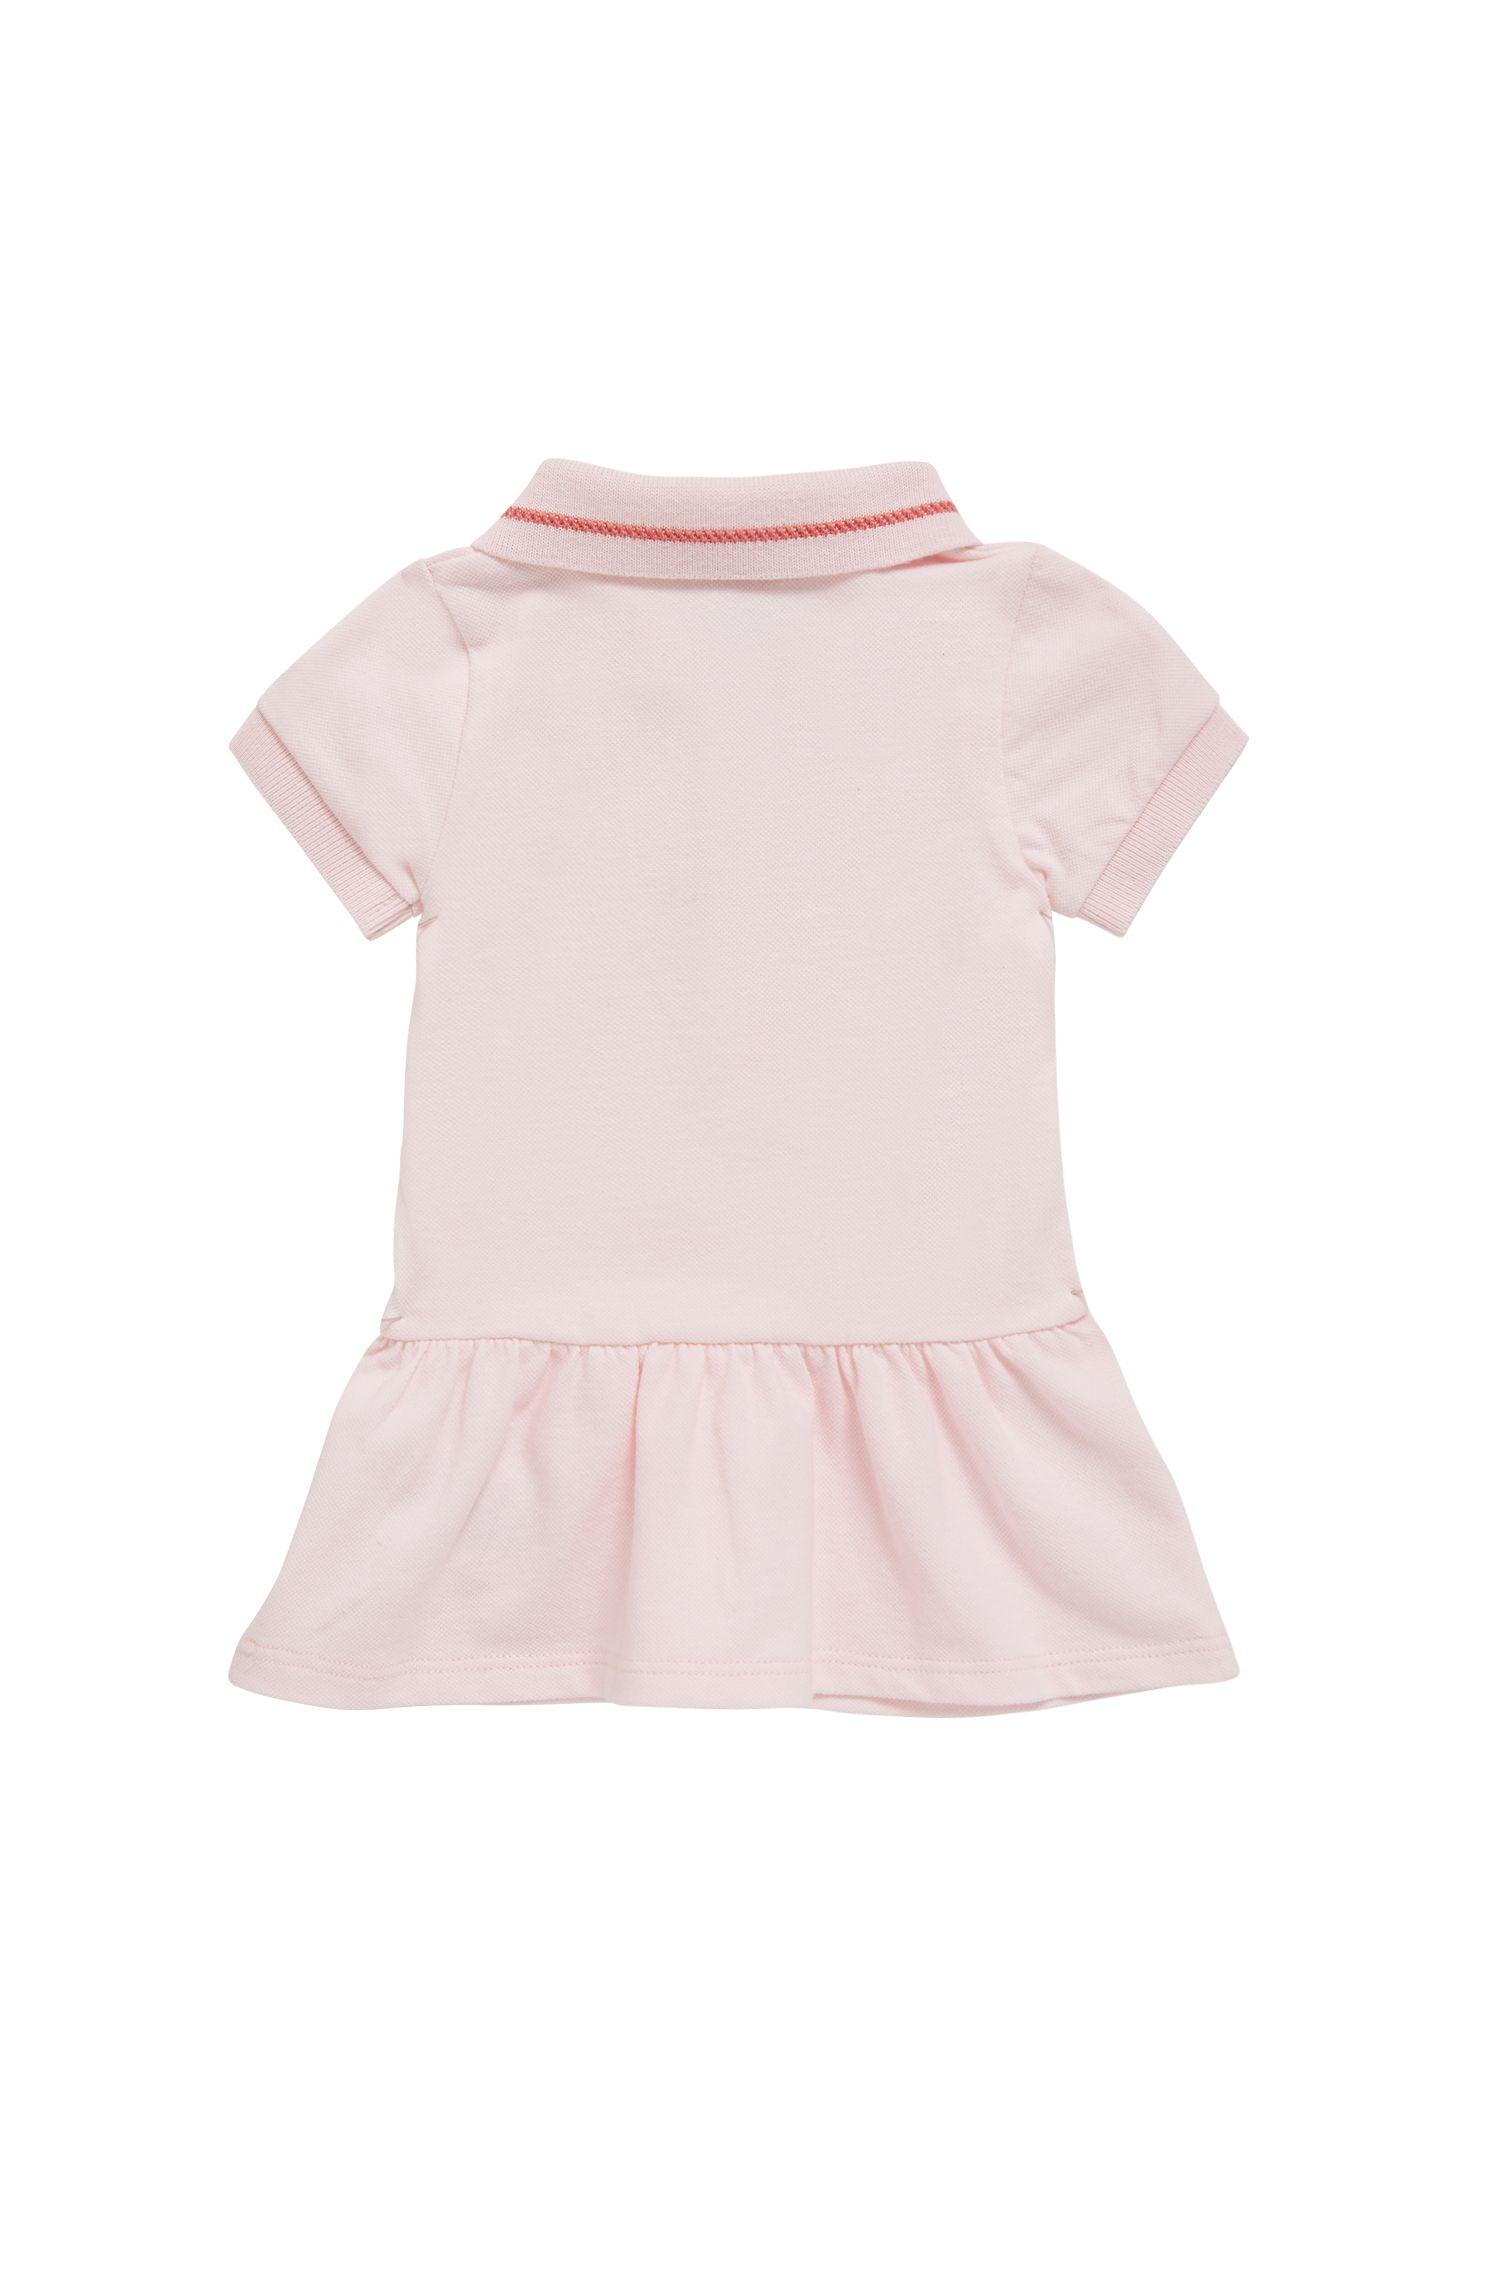 Hugo Boss - Robe de tennis pour bébé en piqué de coton stretch - 2